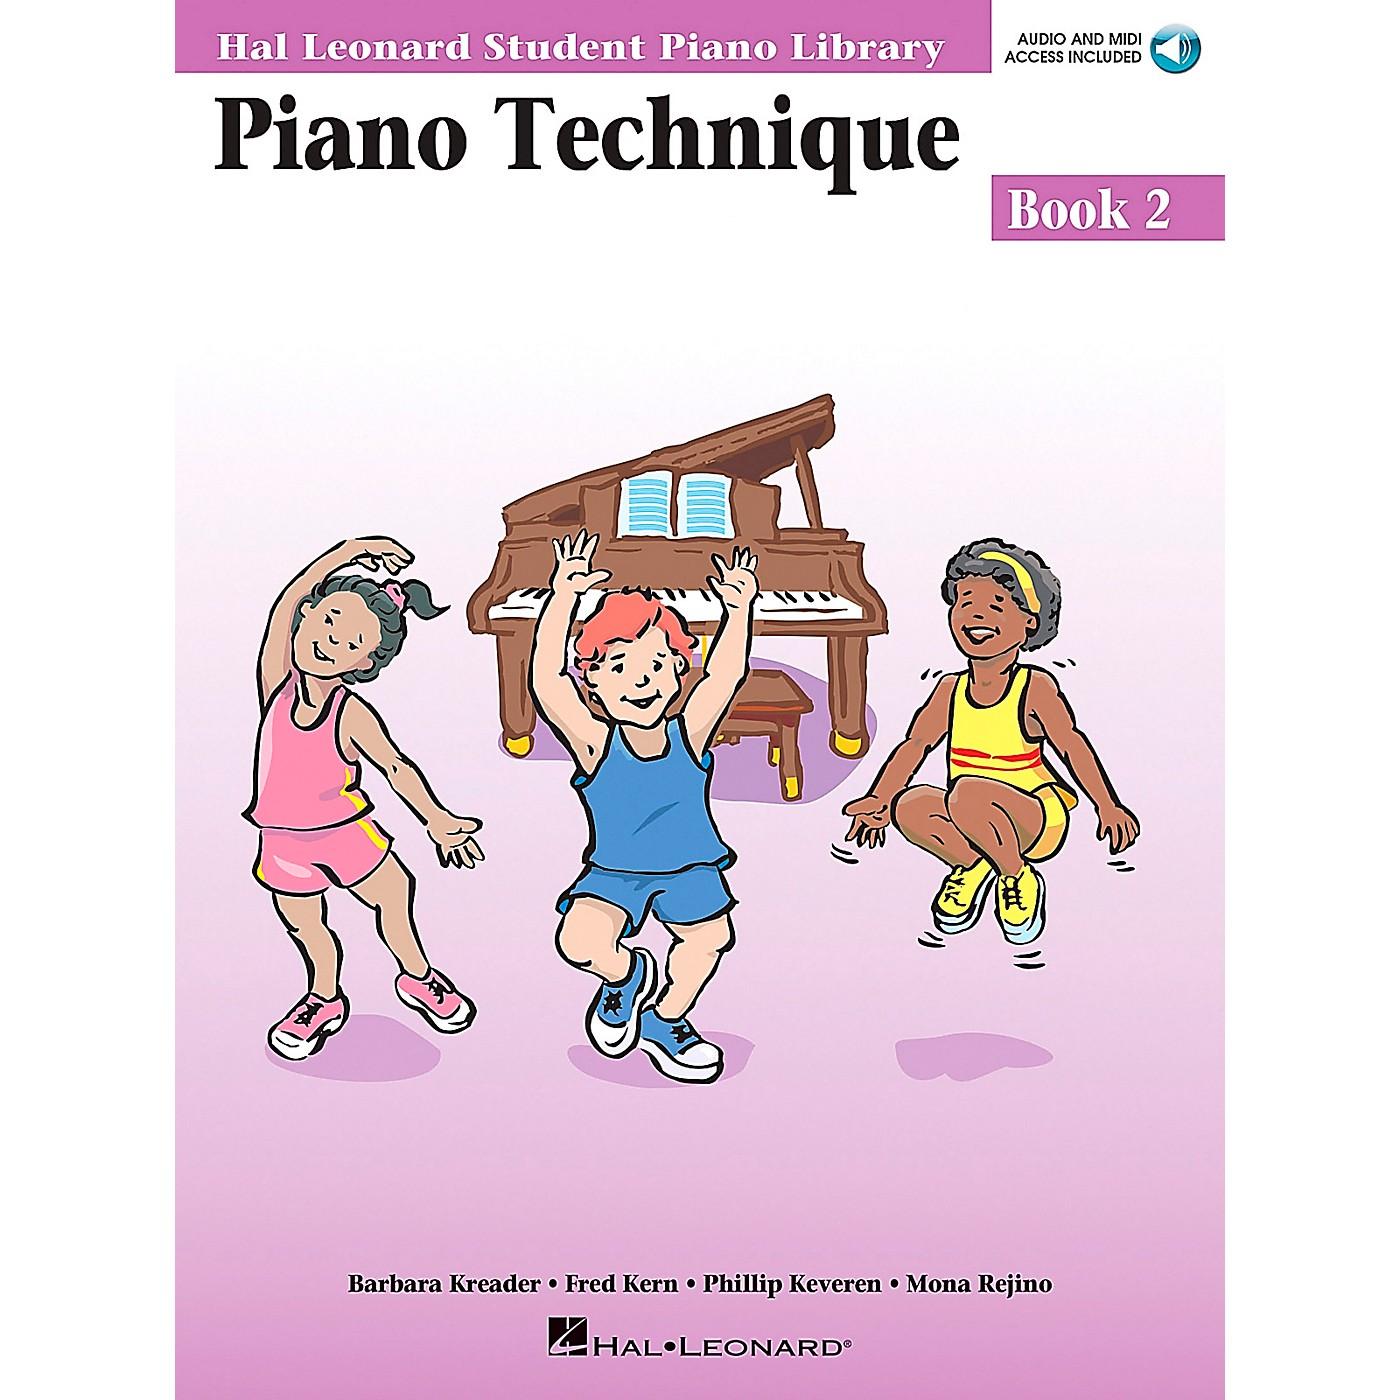 Hal Leonard Piano Technique Book 2 Book/CD Hal Leonard Student Piano Library thumbnail